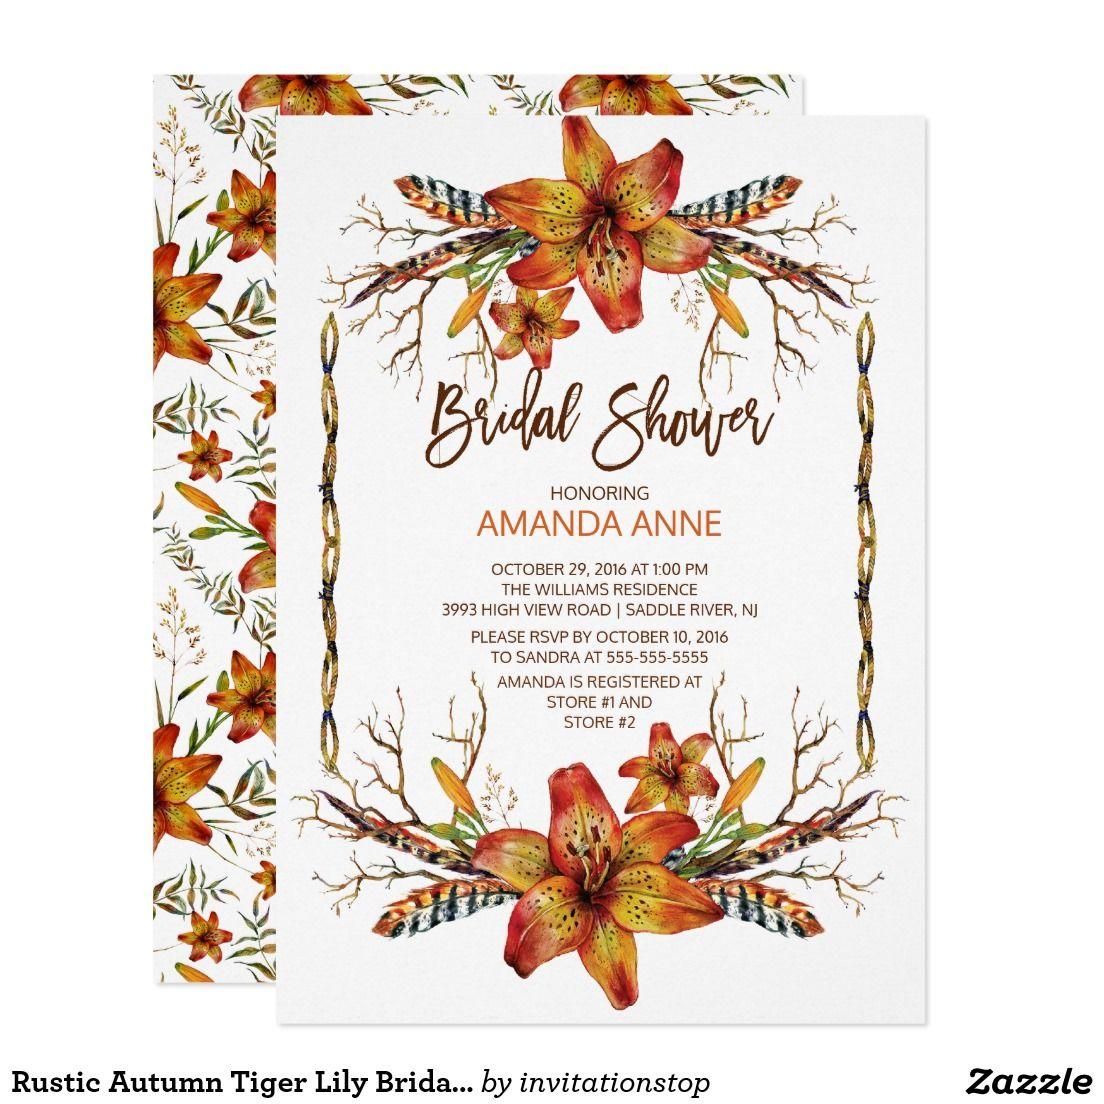 Rustic Autumn Tiger Lily Bridal Shower Invitation | Shower ...